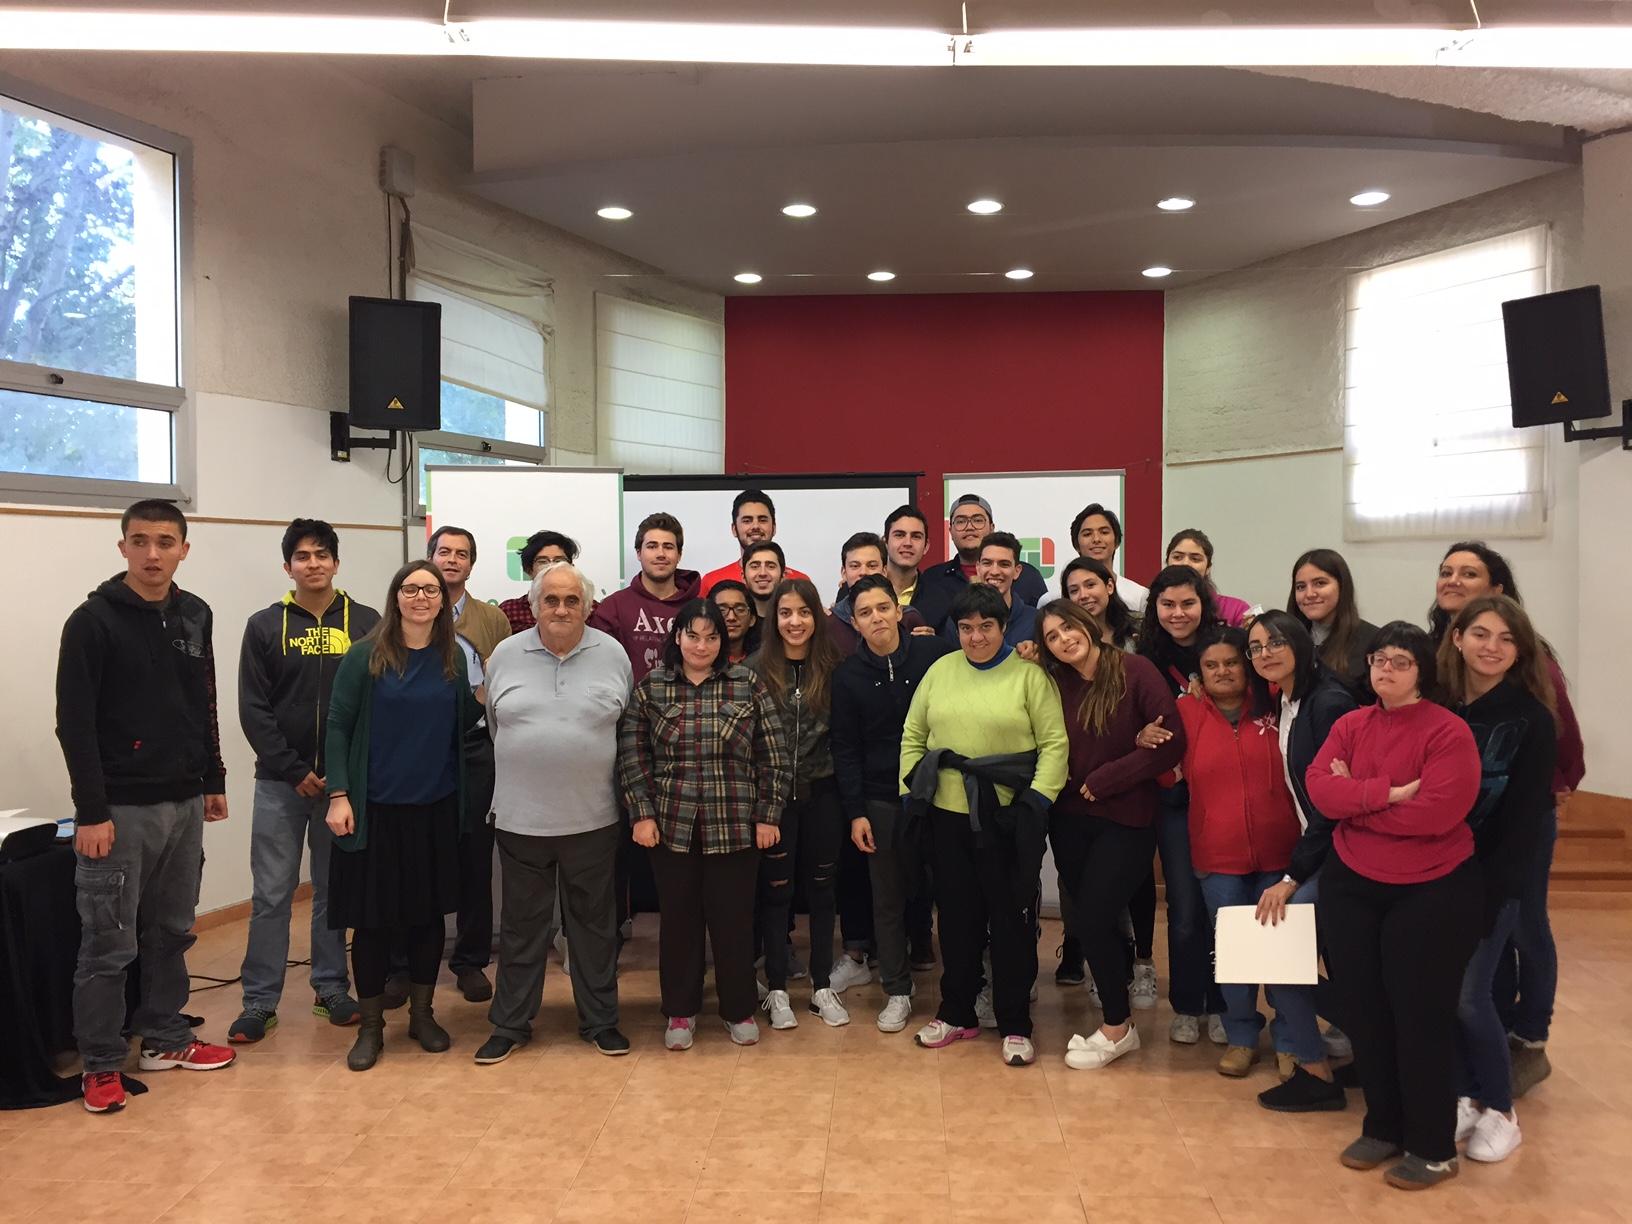 Estudiants de Mèxic ens visiten